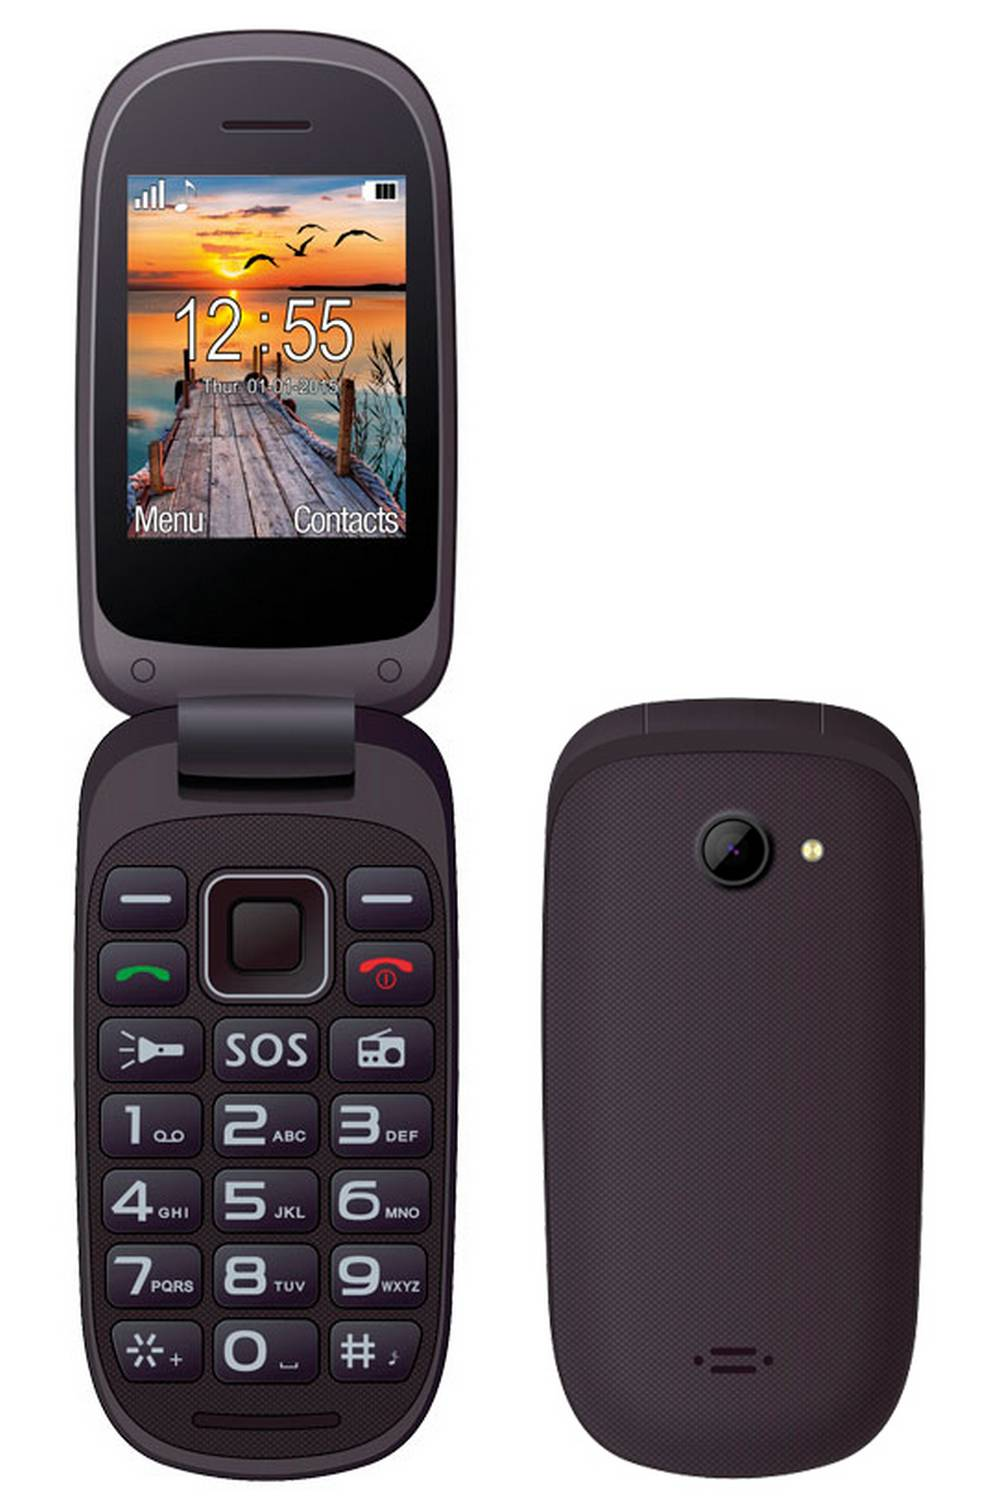 Maxcom MM818 (Dual Sim) με Μεγάλα Πλήκτρα, Ραδιόφωνο (Λειτουργεί χωρίς Handsfree) και Πλήκτρο Έκτακτης Ανάγκης Μαύρο